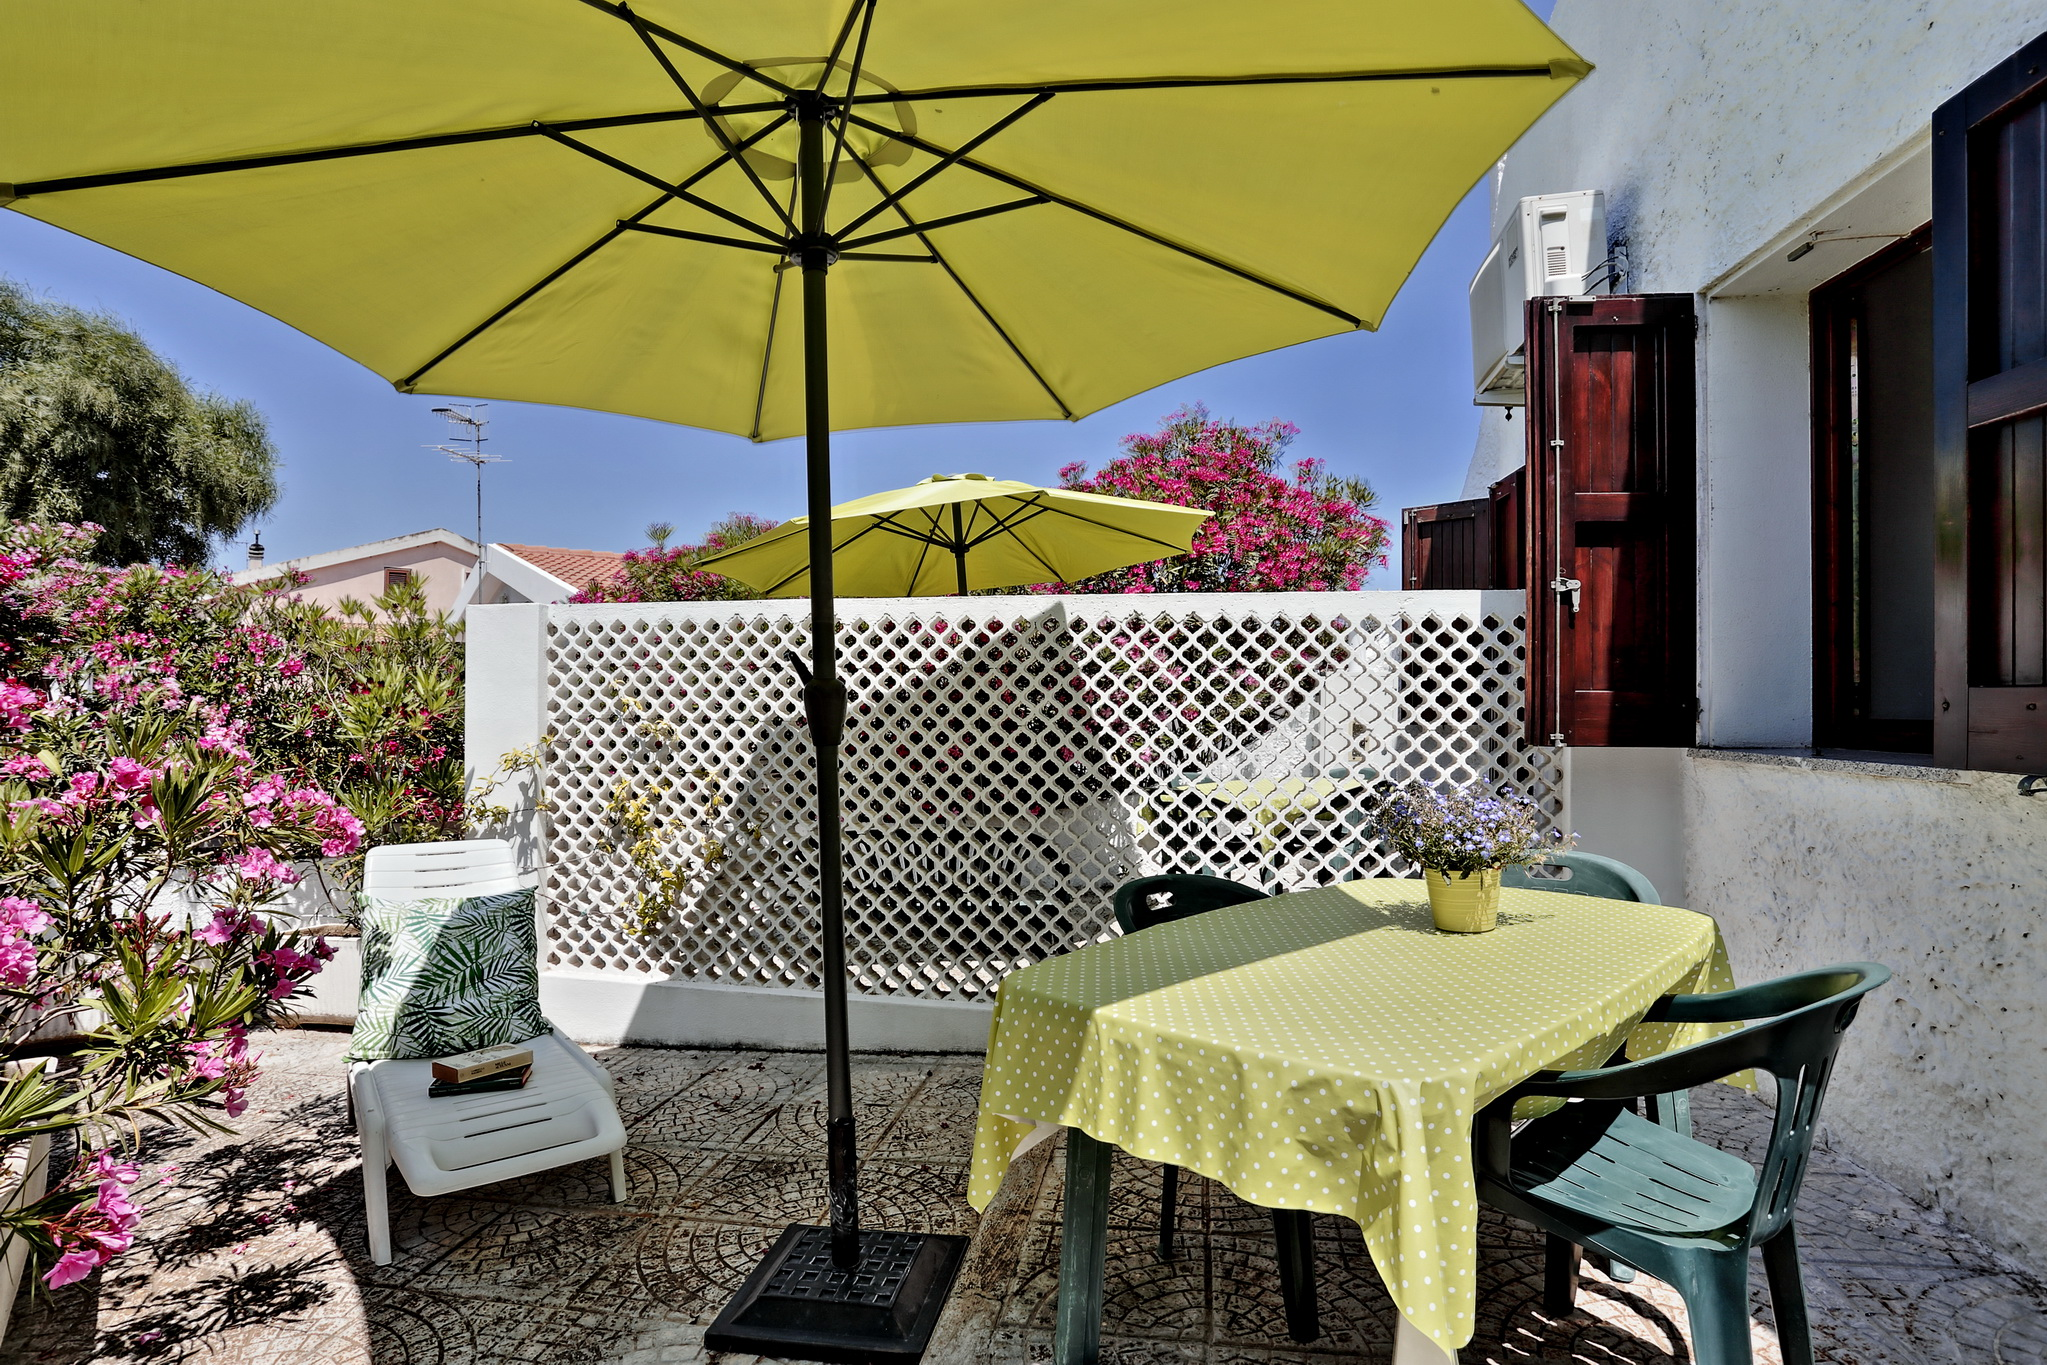 Studio con patio (8)